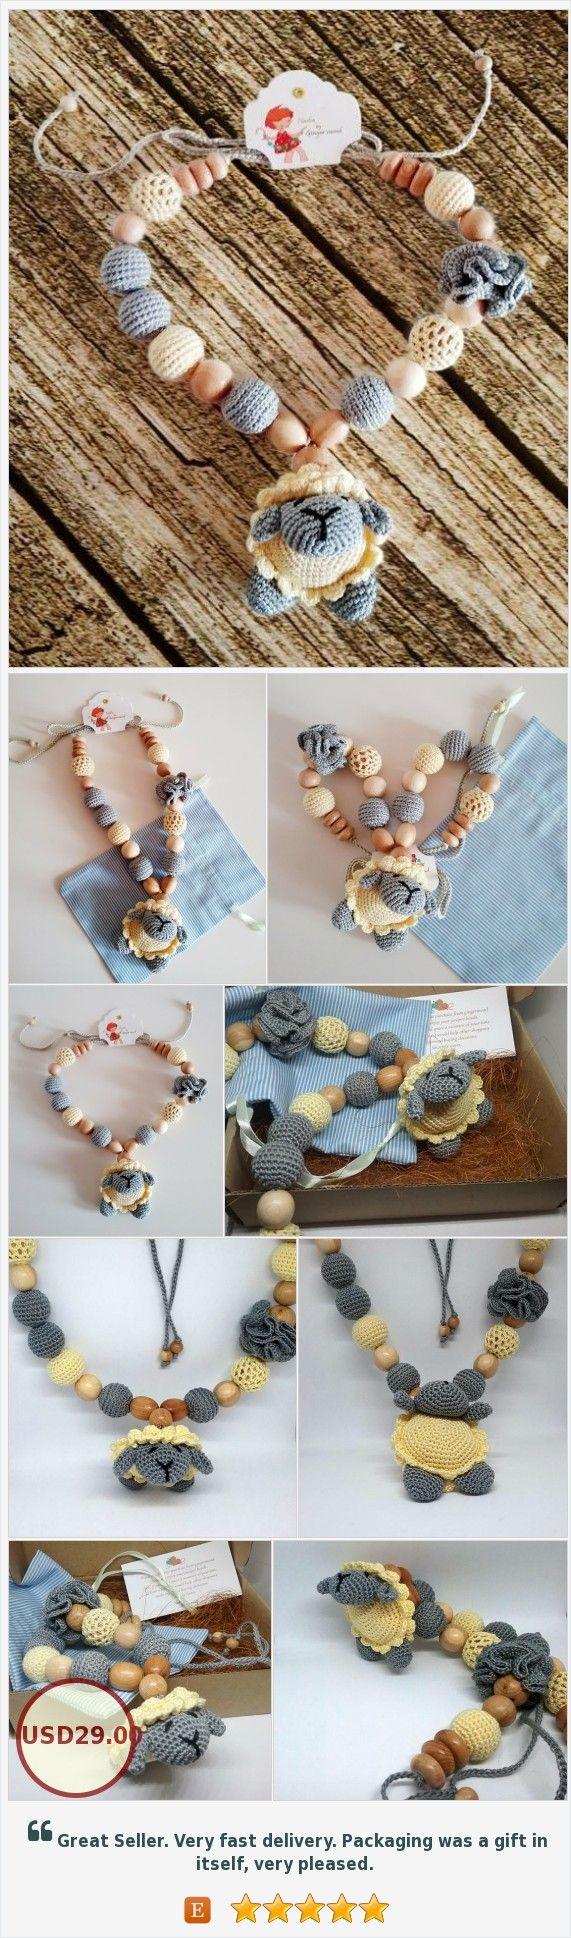 children's accessories handmade by gingermood-#Nursingnecklace , #Teethingnecklace,#Amigurumicrochet, #Breastfeeding, #Montessoriinspired